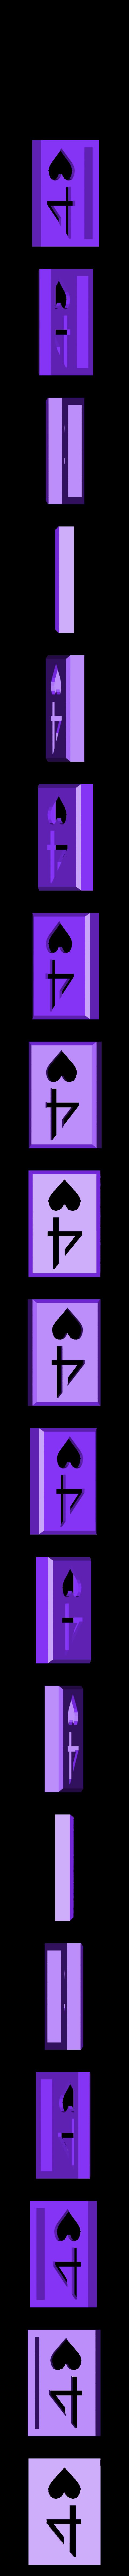 BlockHearts04.stl Download STL file Playing Card Tiles • Object to 3D print, Jinja